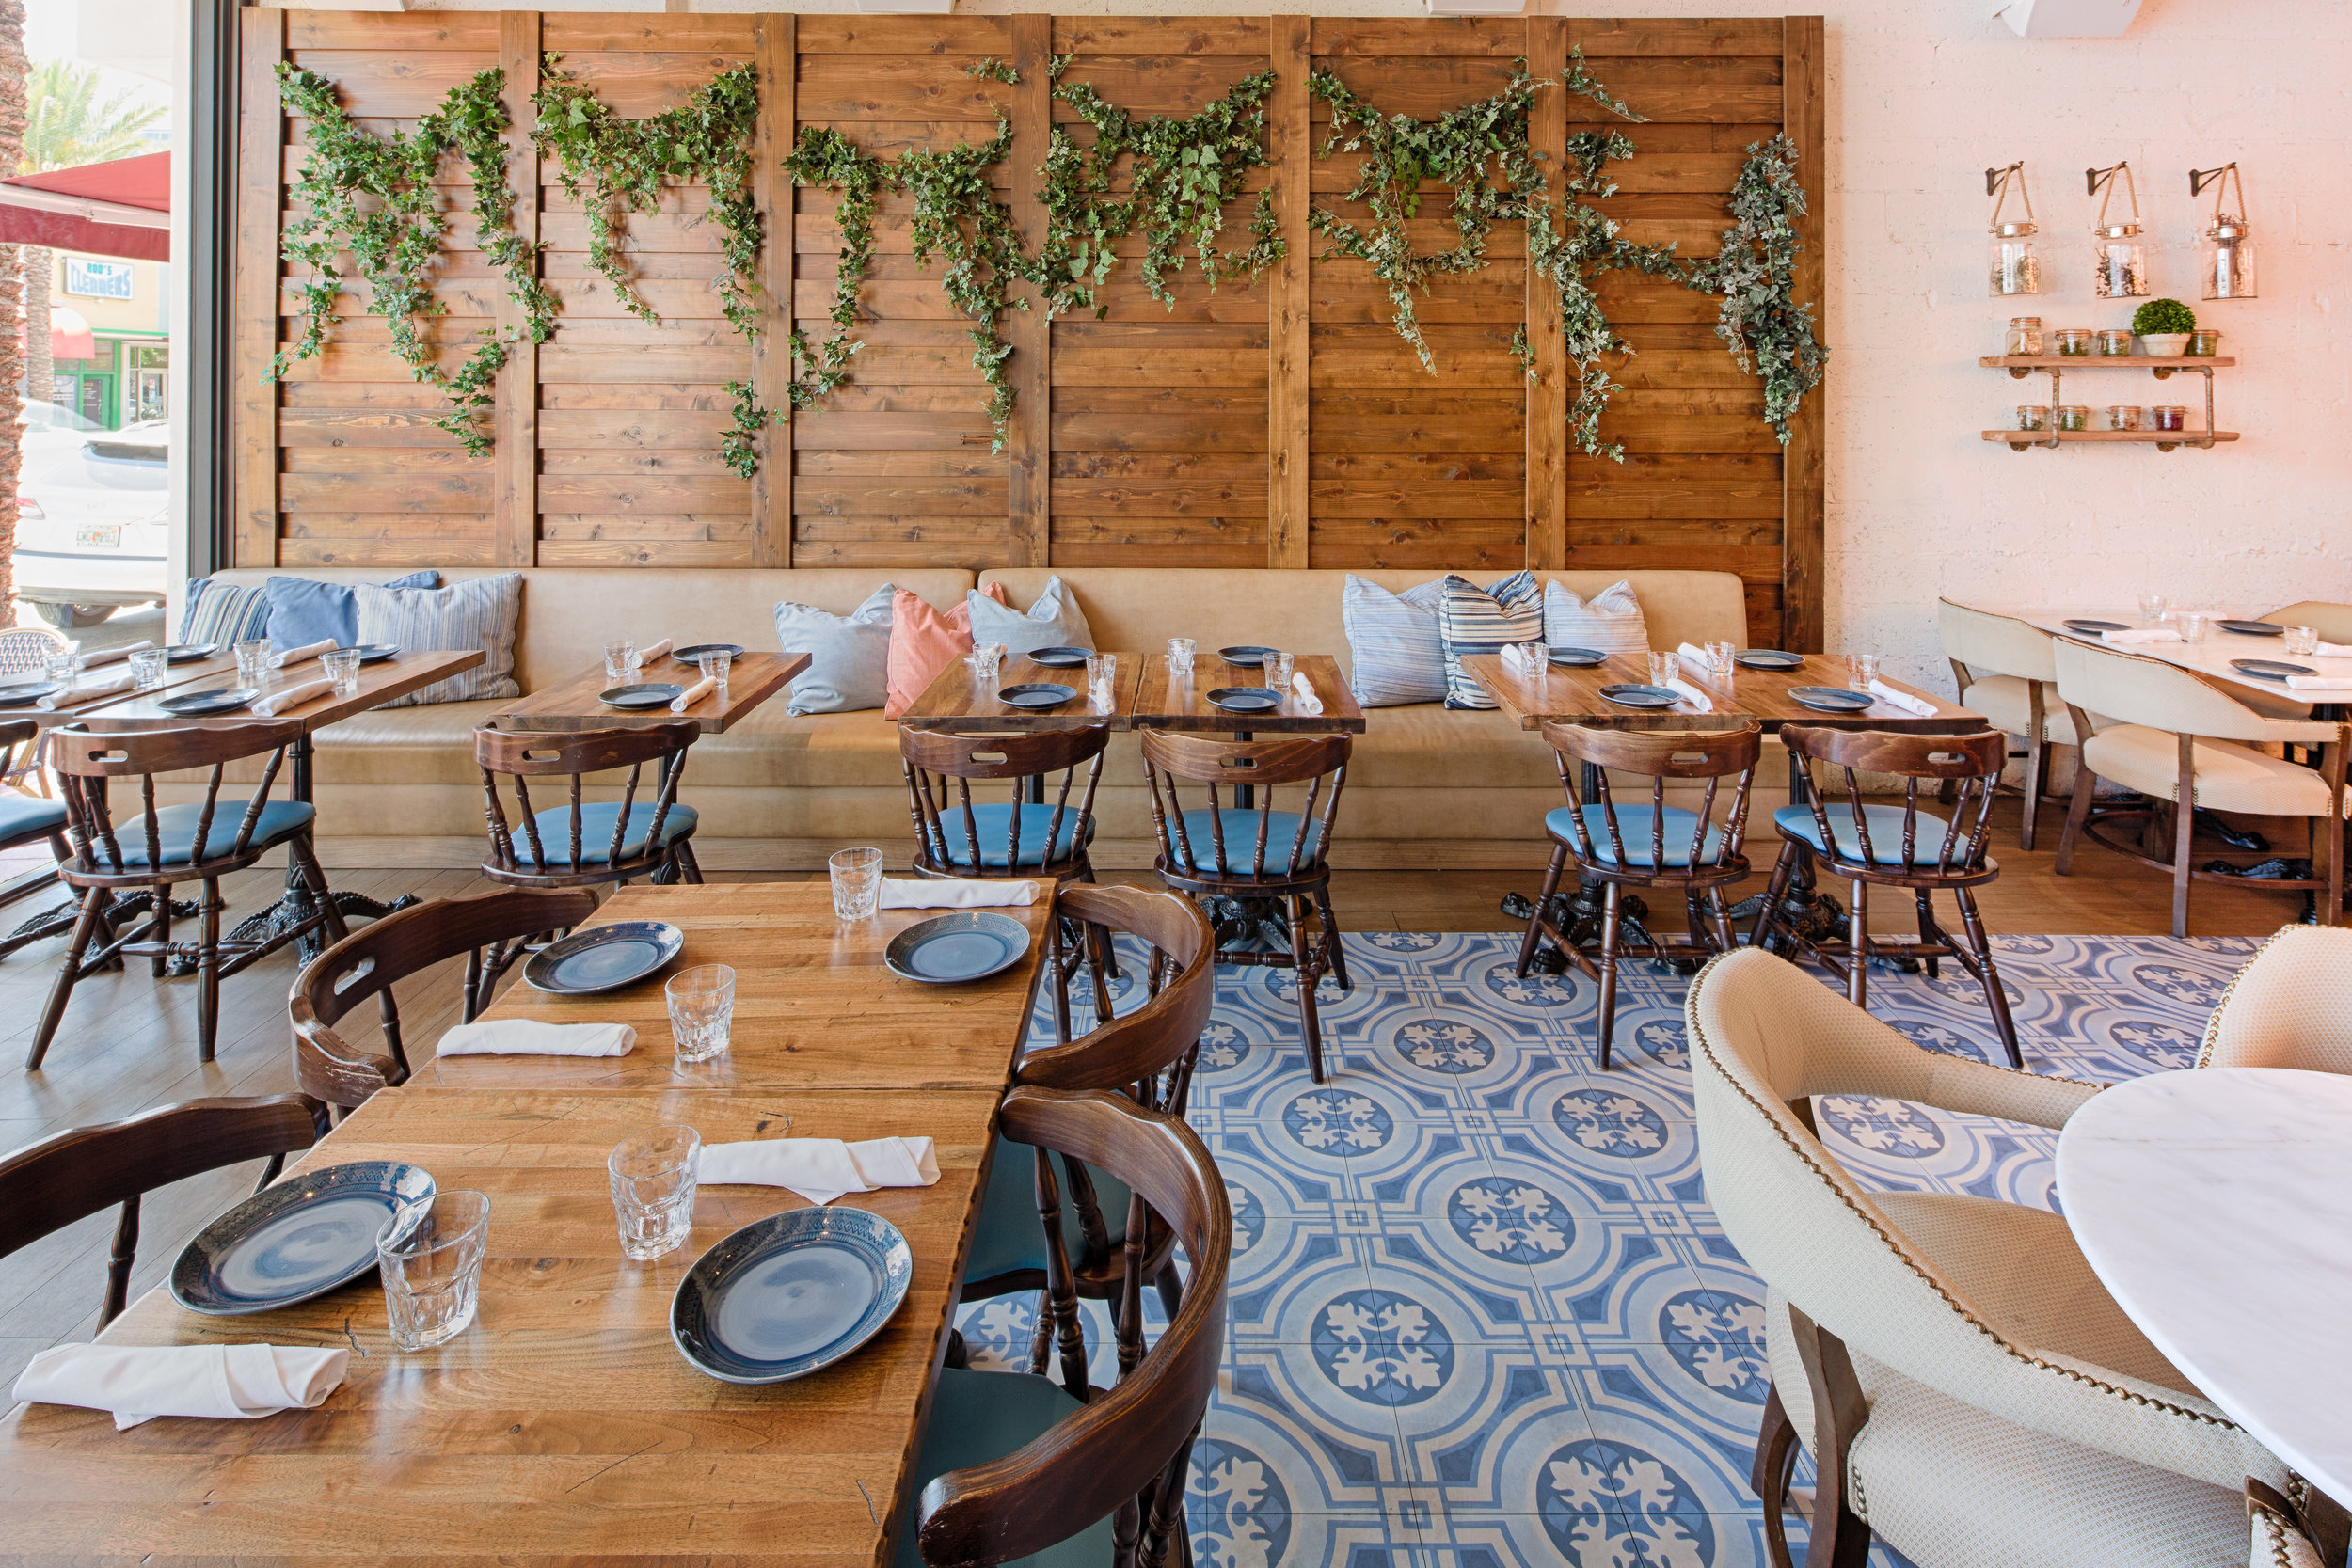 05_1511_2017-03-21a_Rustiko Restaurant 9476 Harding_HDR__PSD.jpg